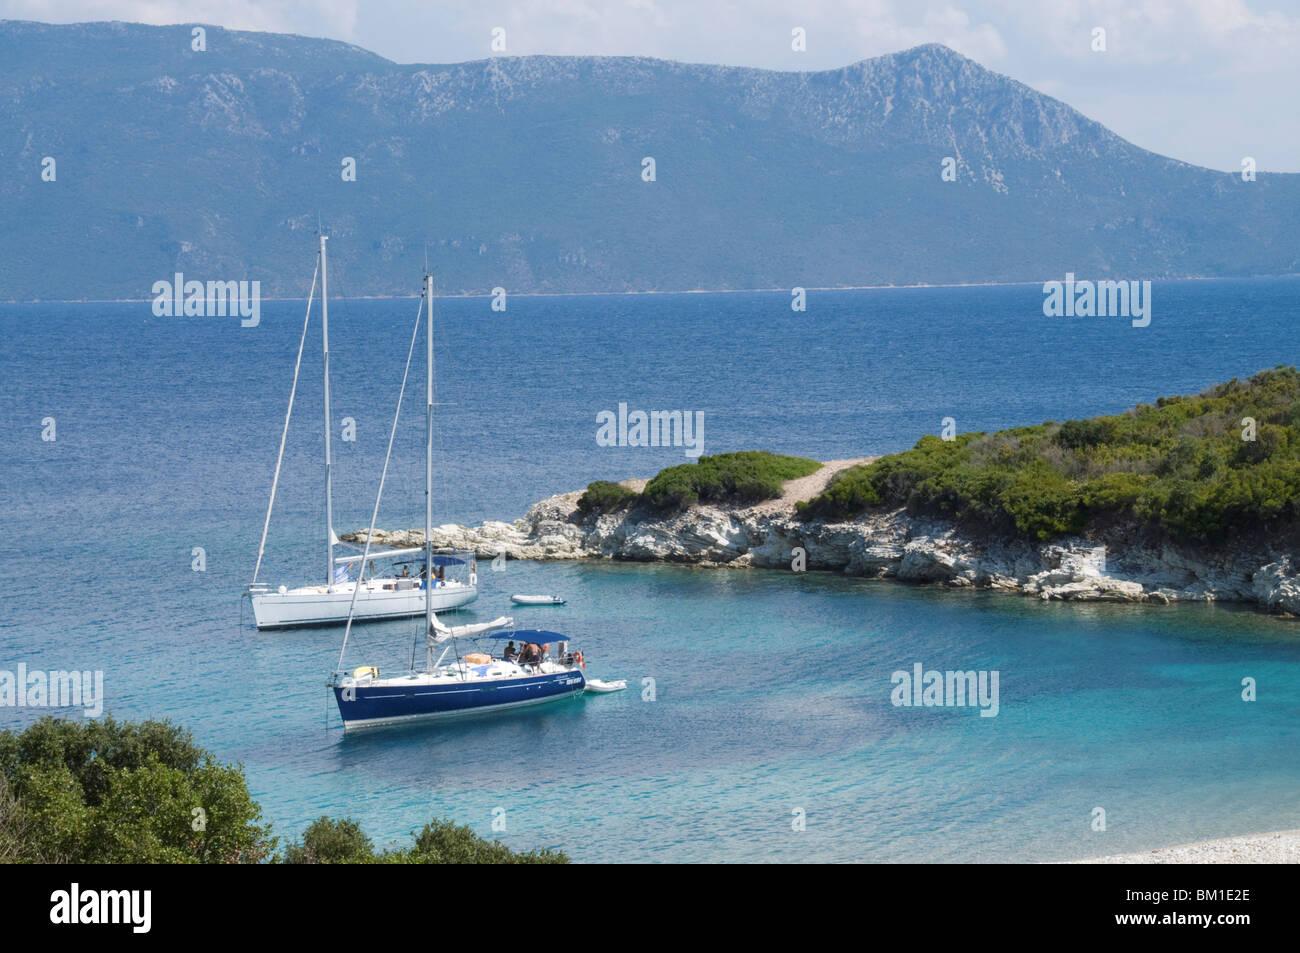 Sailing boats, Meganisi, Ionian Islands, Greek Islands, Greece, Europe - Stock Image